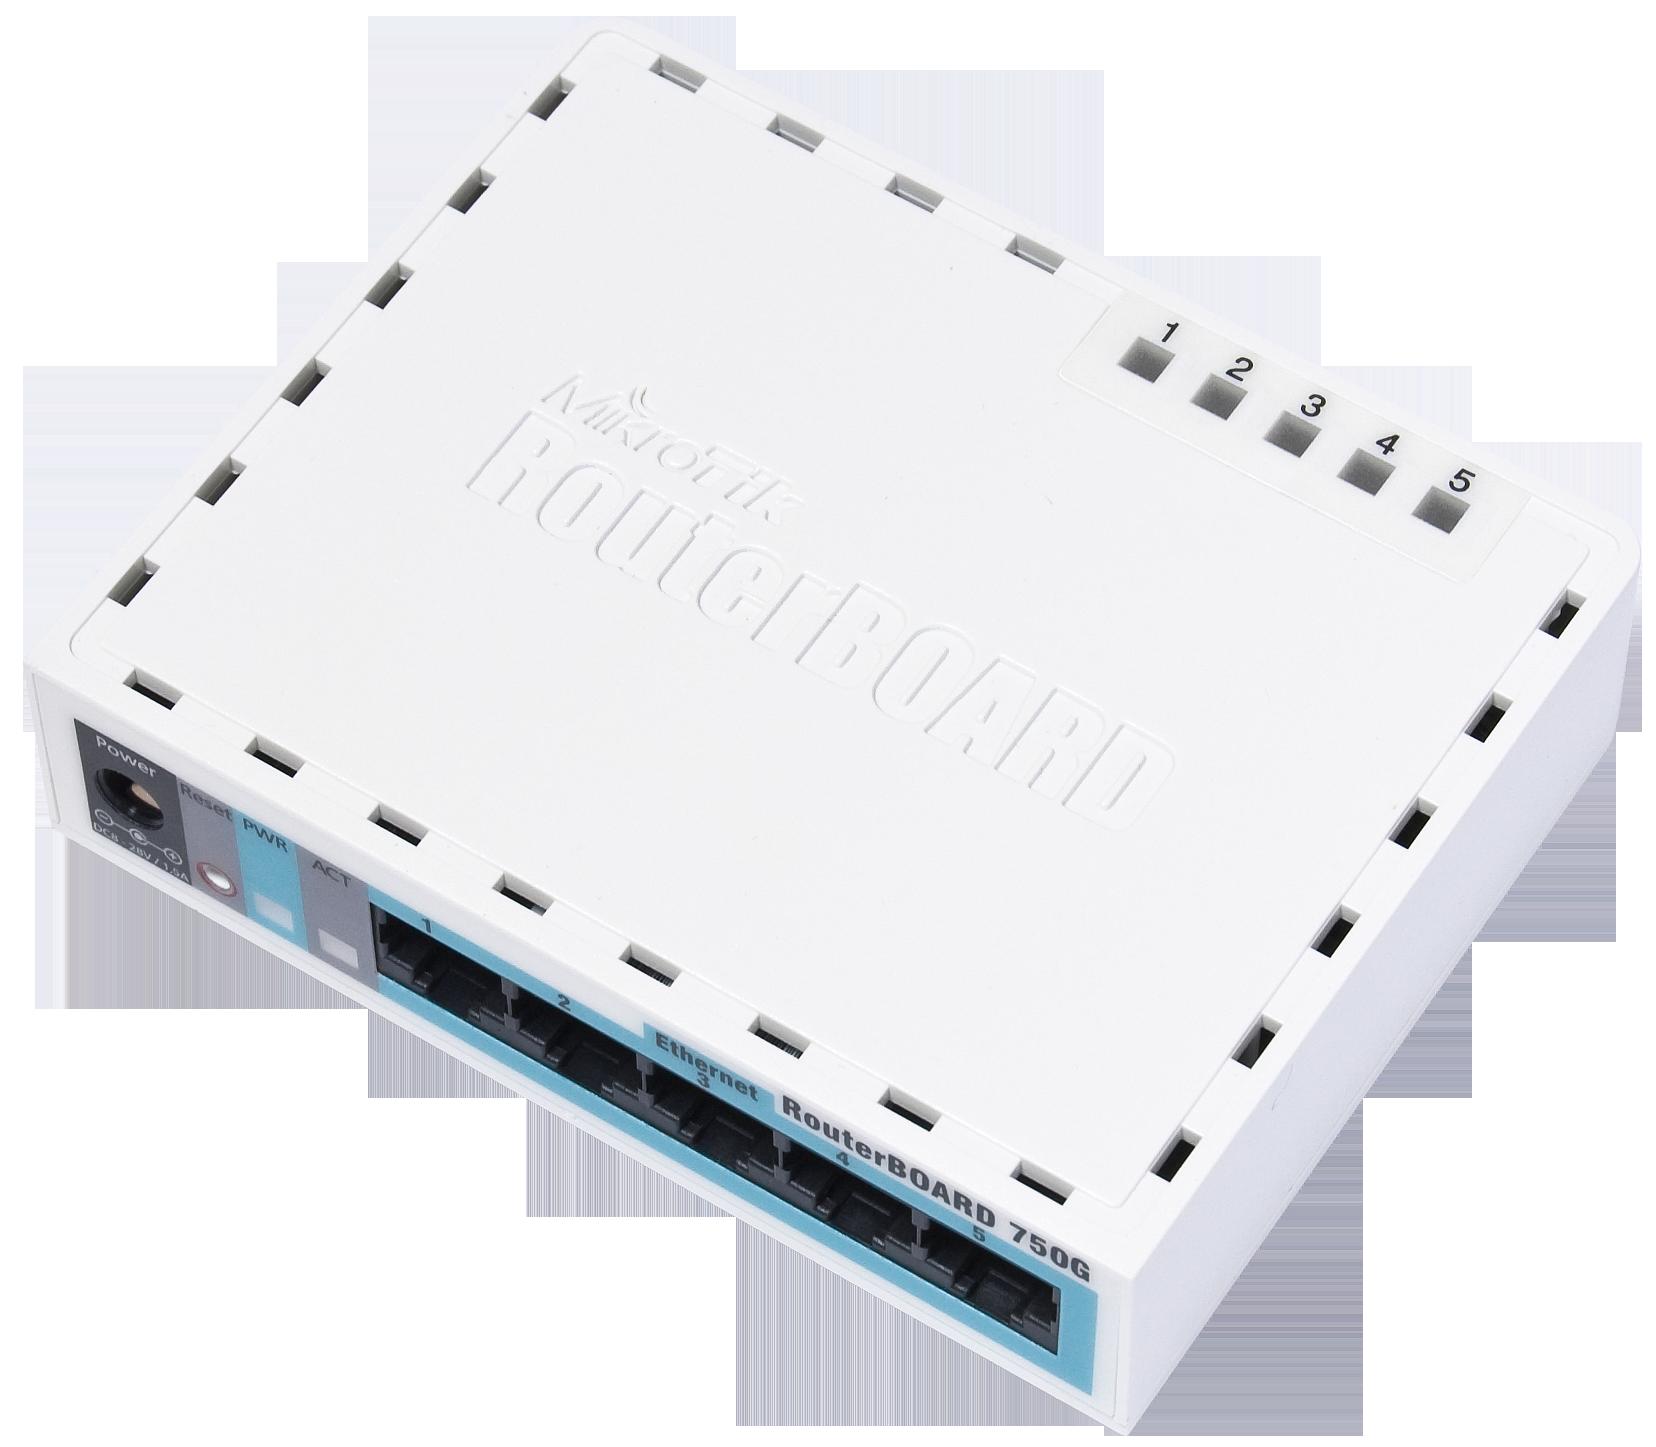 mikrotik routerboard manual pdf